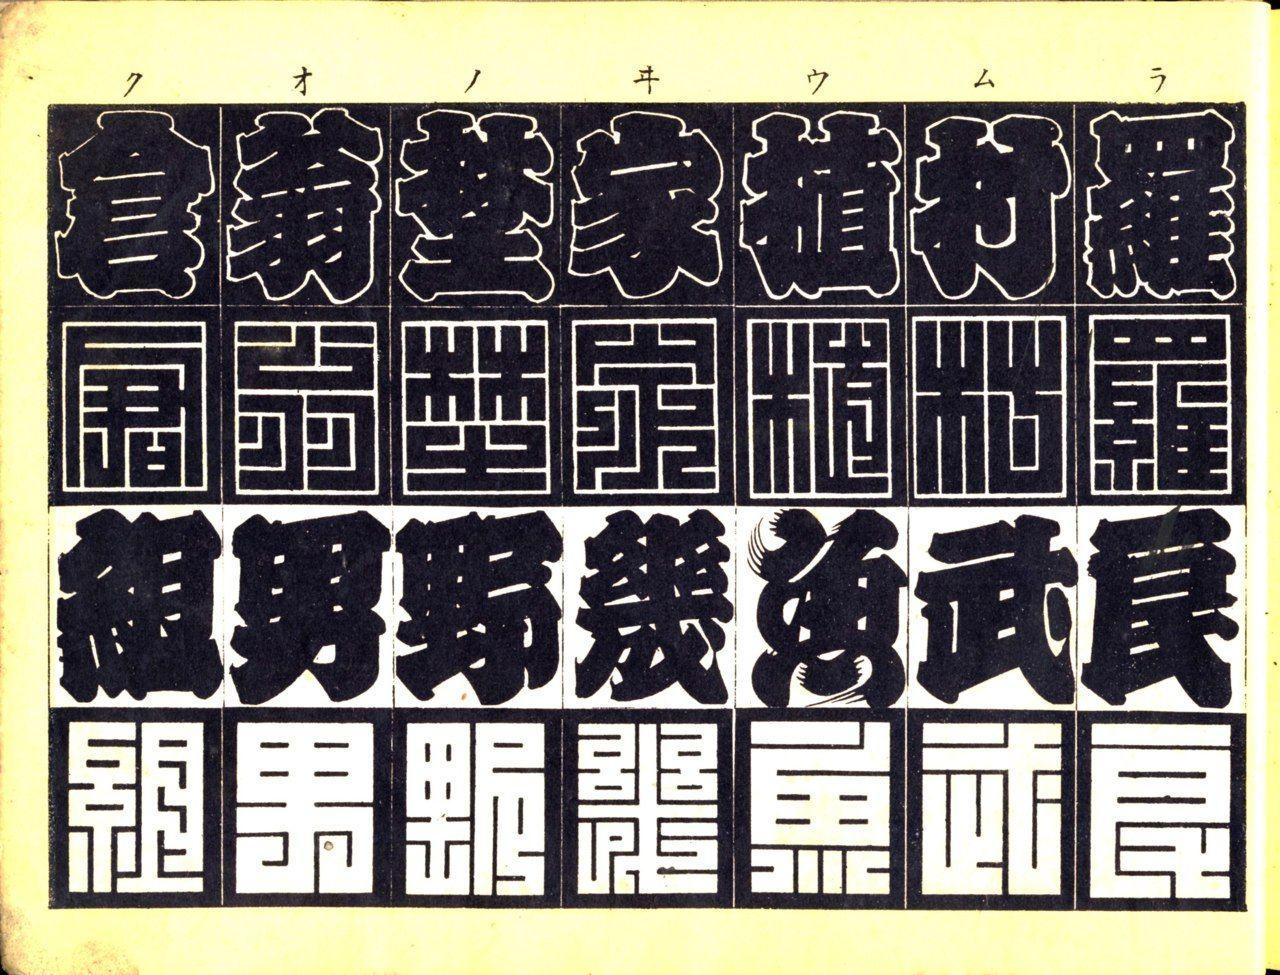 汉字设计 moji 印と文字見本集 高橋藤之助 via sundayjump japanese typography typography design graffiti lettering